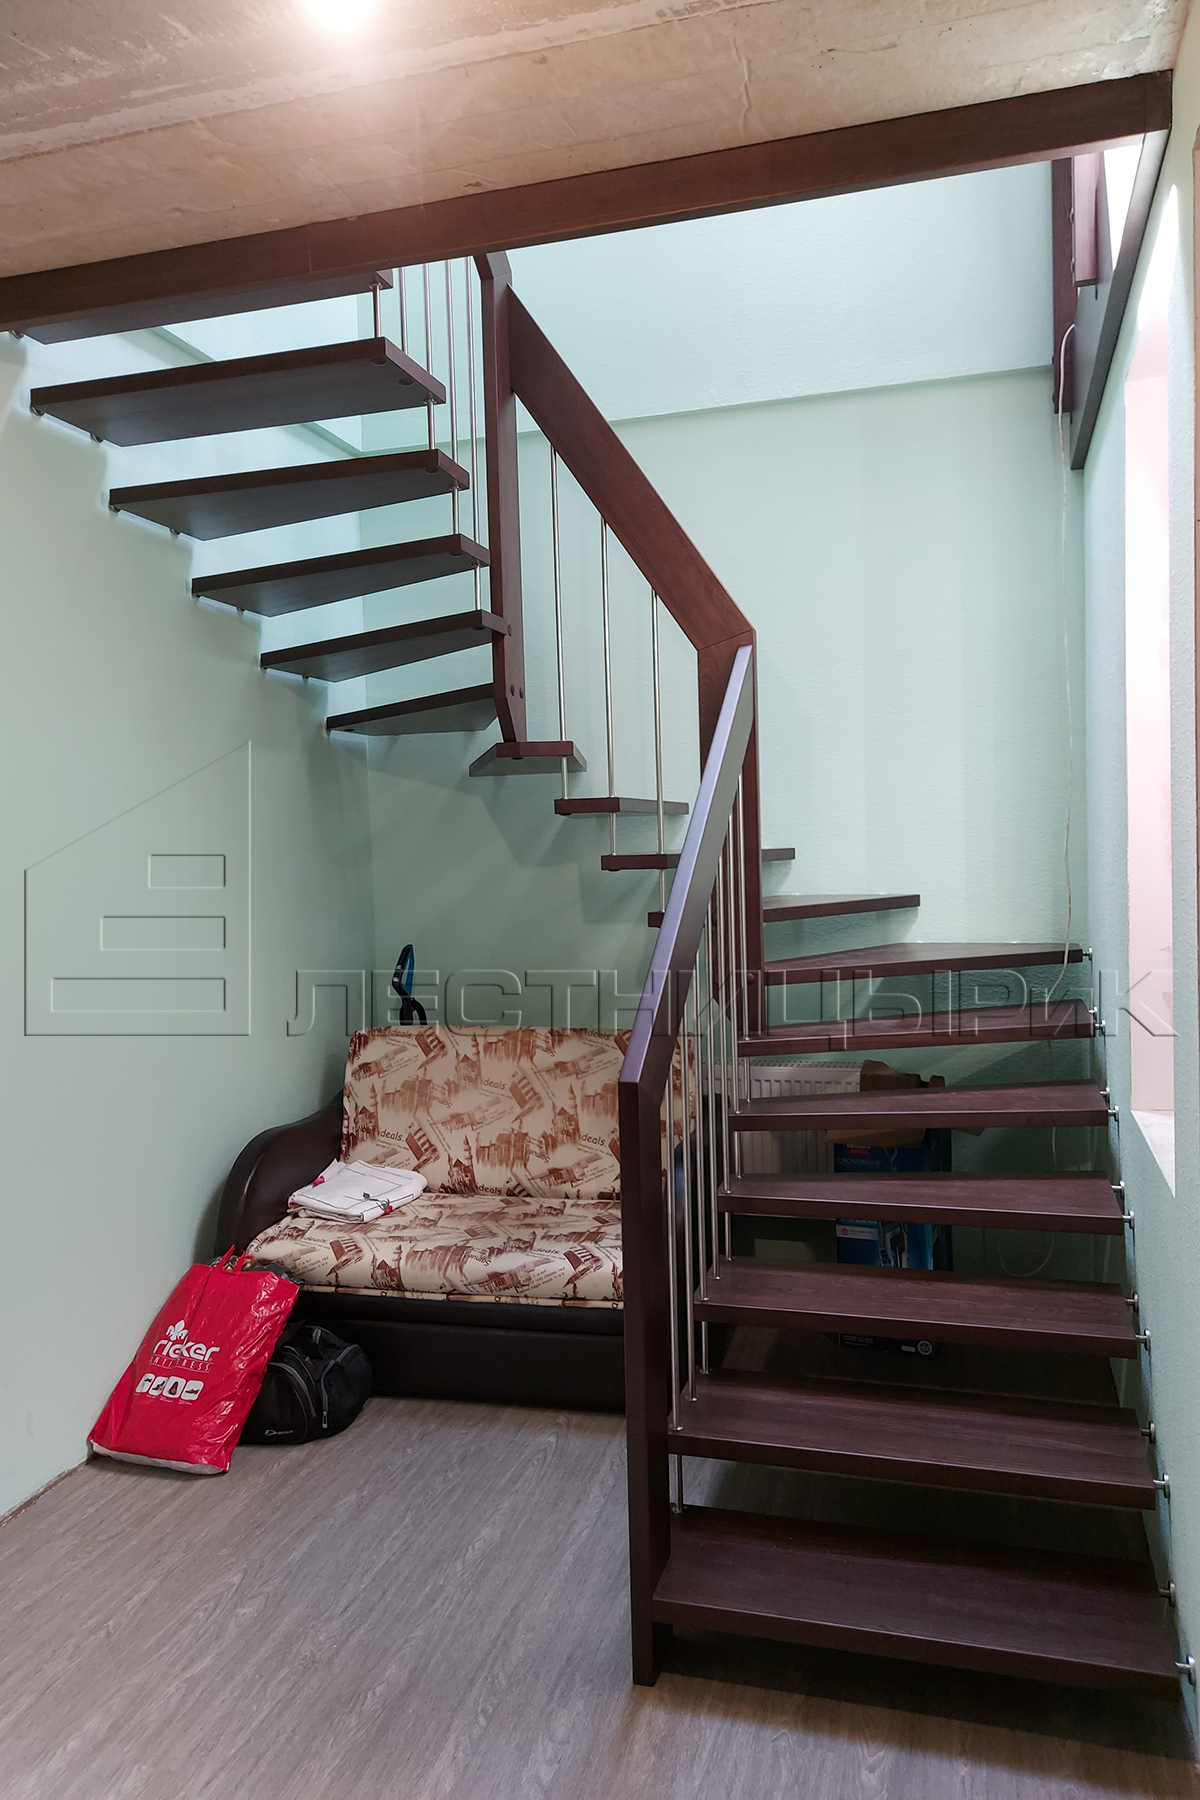 Буковая лестница на больцах на заказ в Екатеринбурге